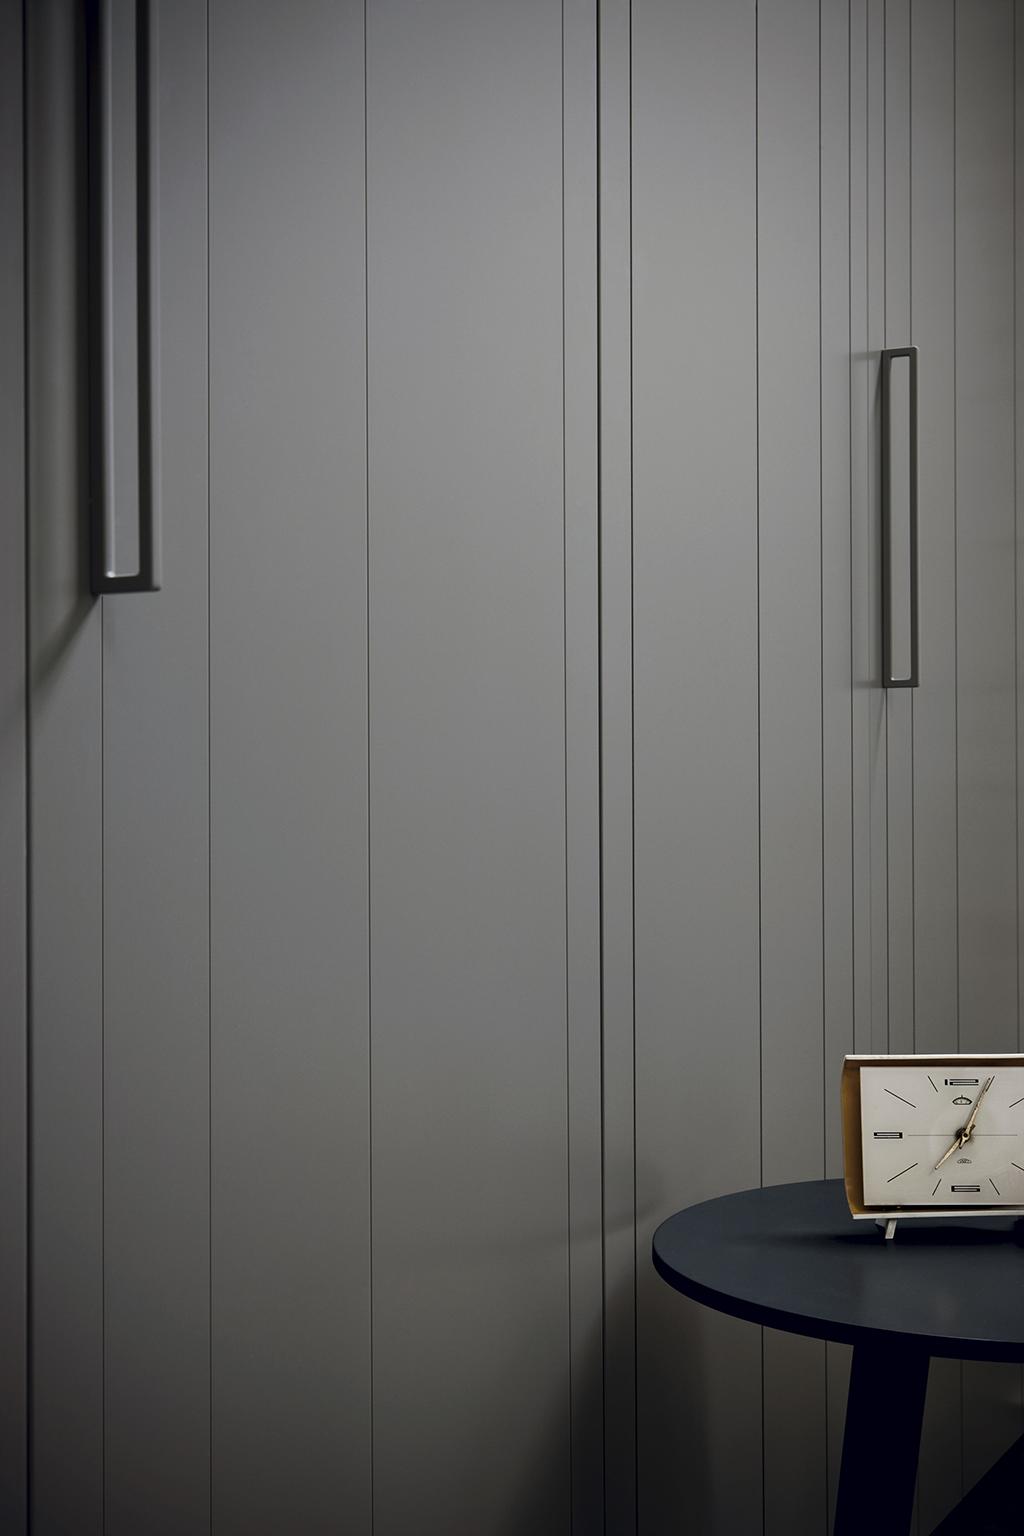 amore 082 fitted bedroom furniture wardrobes uk lawrence walsh furniture. Black Bedroom Furniture Sets. Home Design Ideas